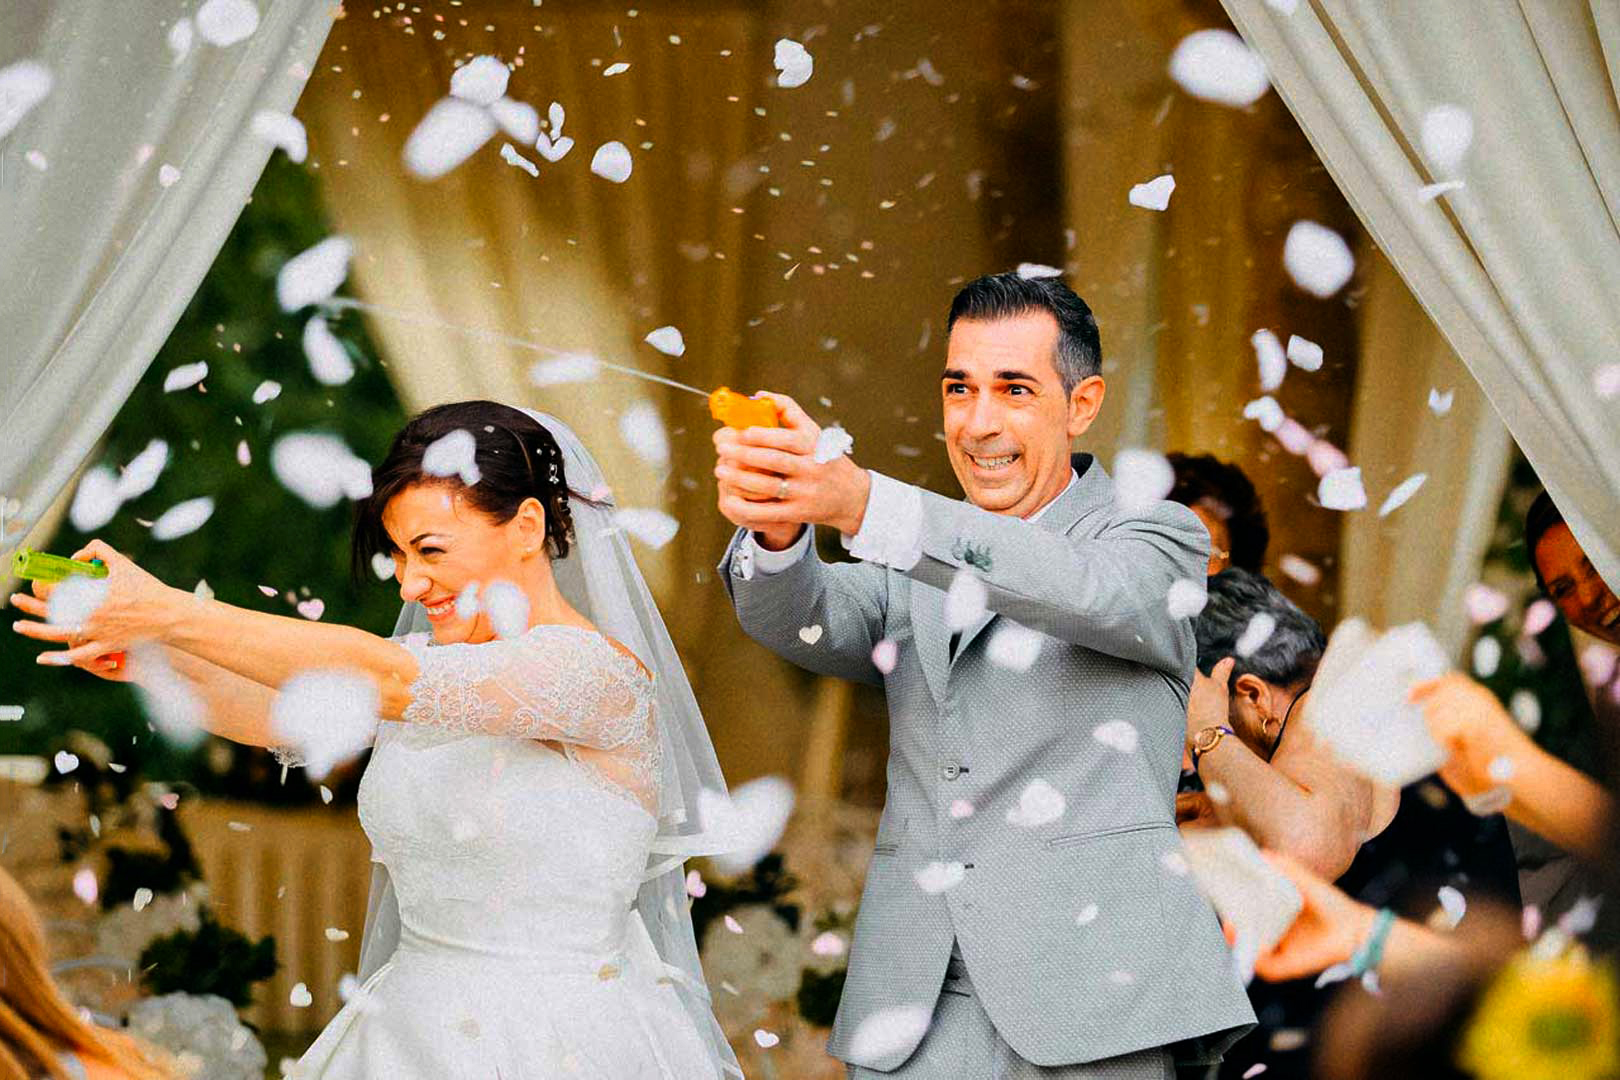 018-uscita-chiesa-matrimonio-gianni-lepore-fotografo